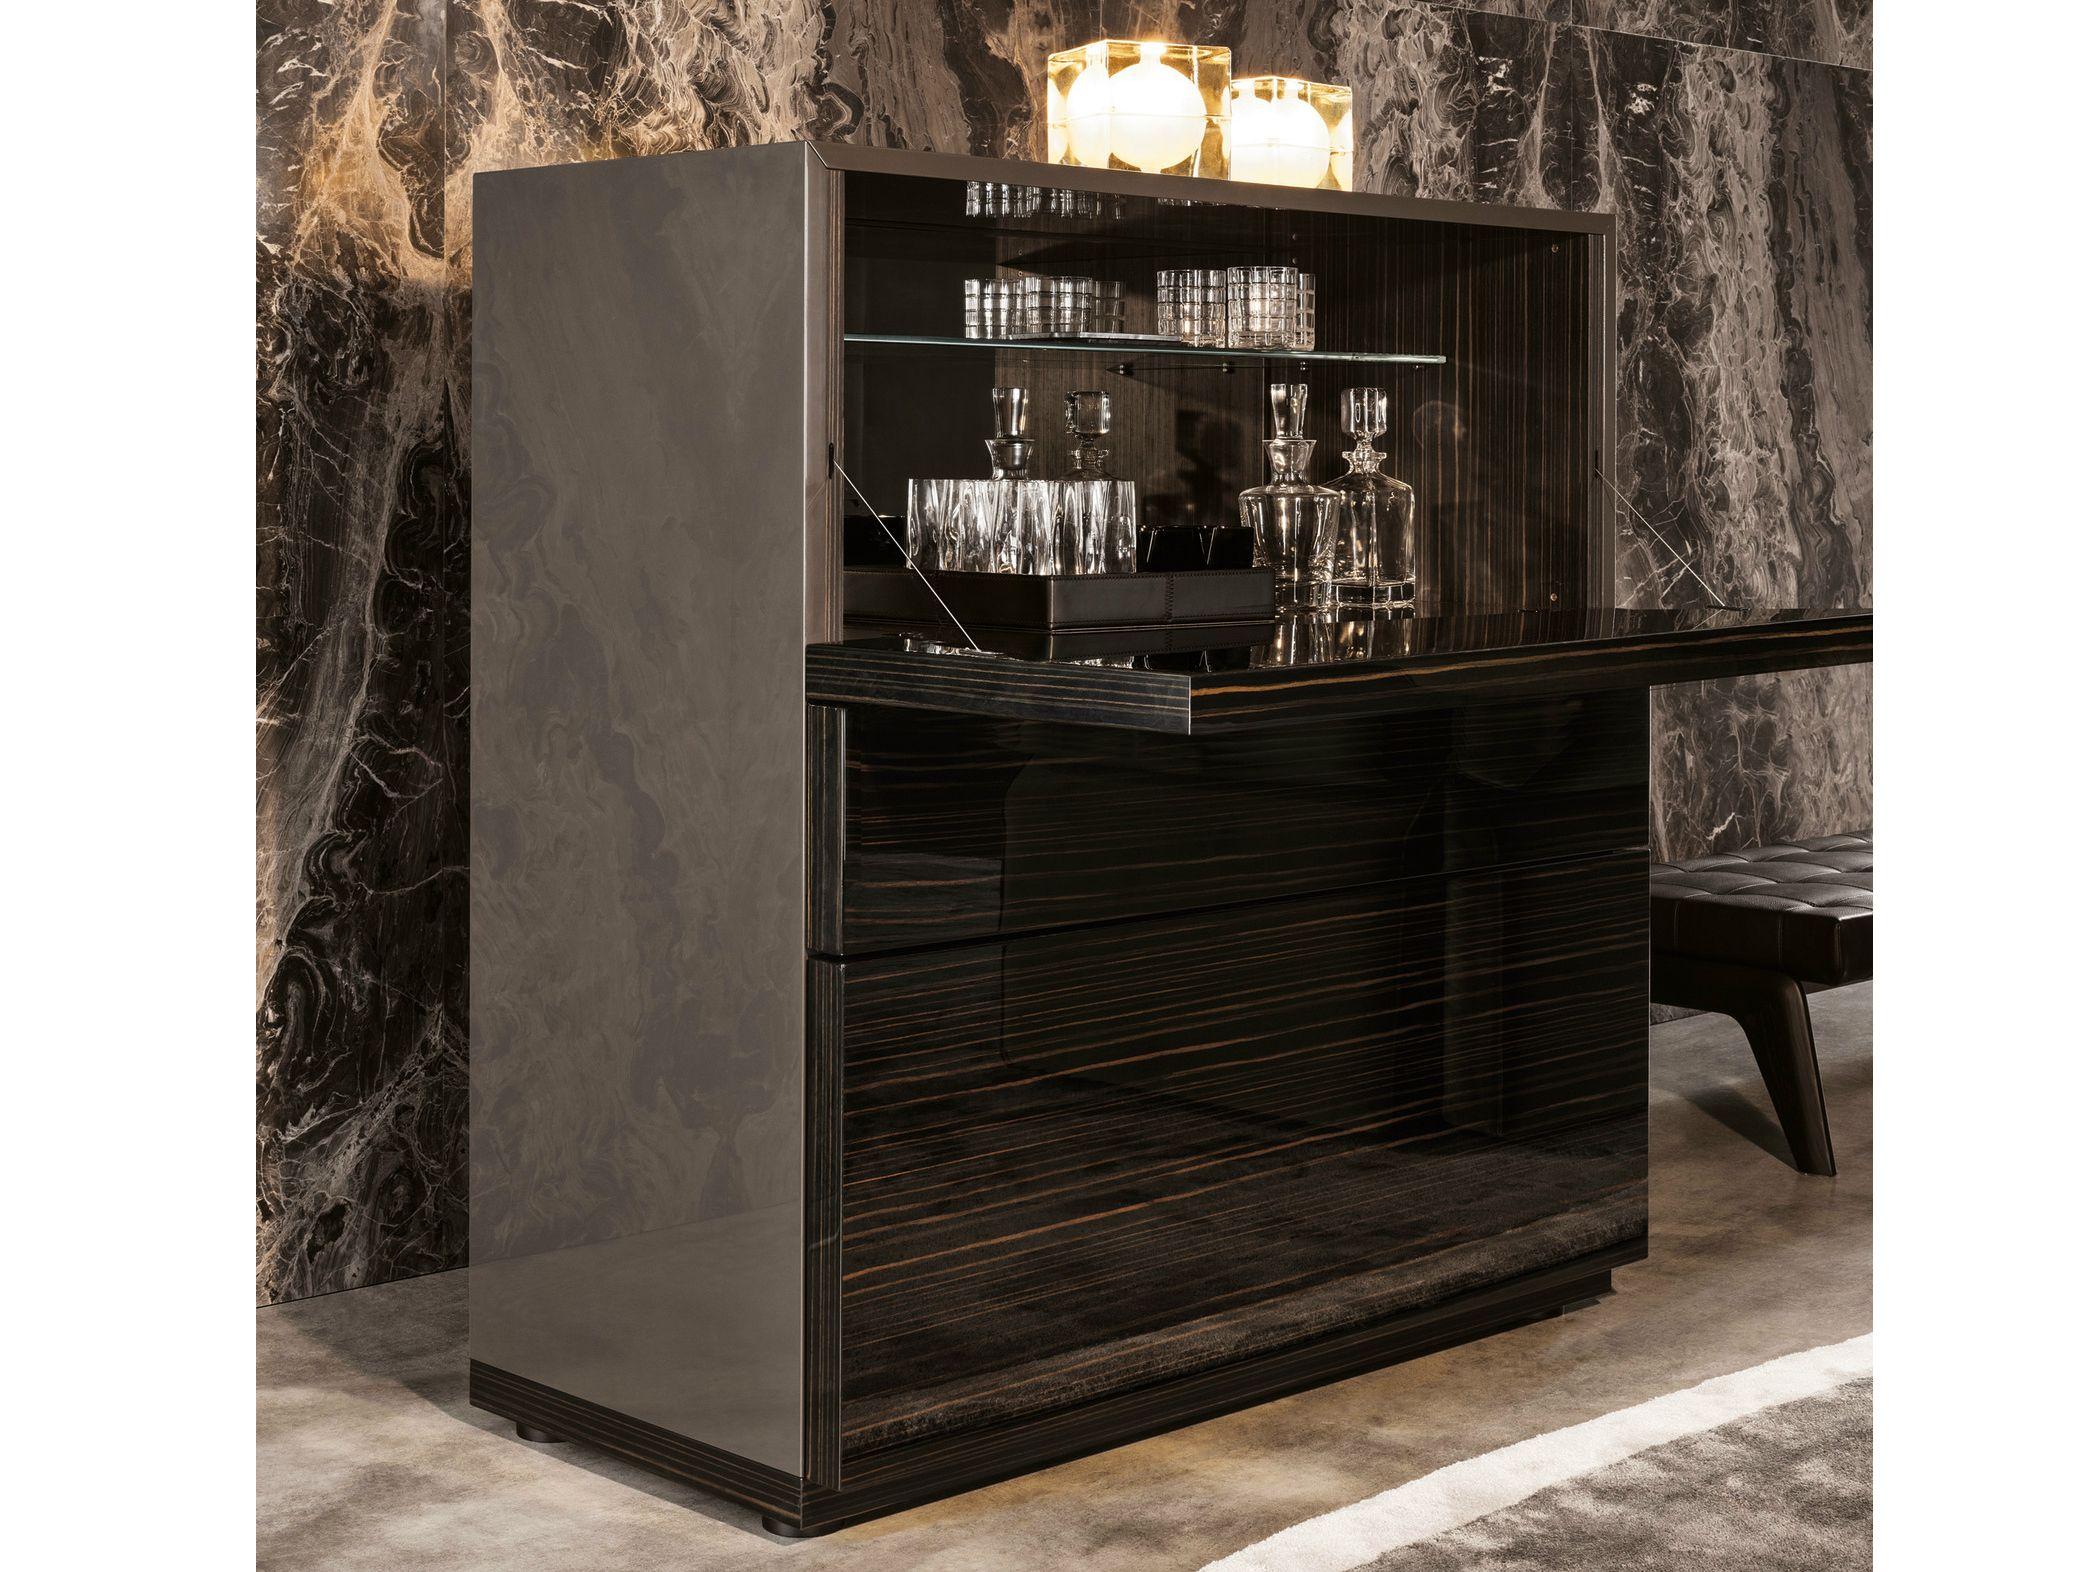 LANG Bar cabinet by Minotti design Rodolfo Dordoni | home bar ...